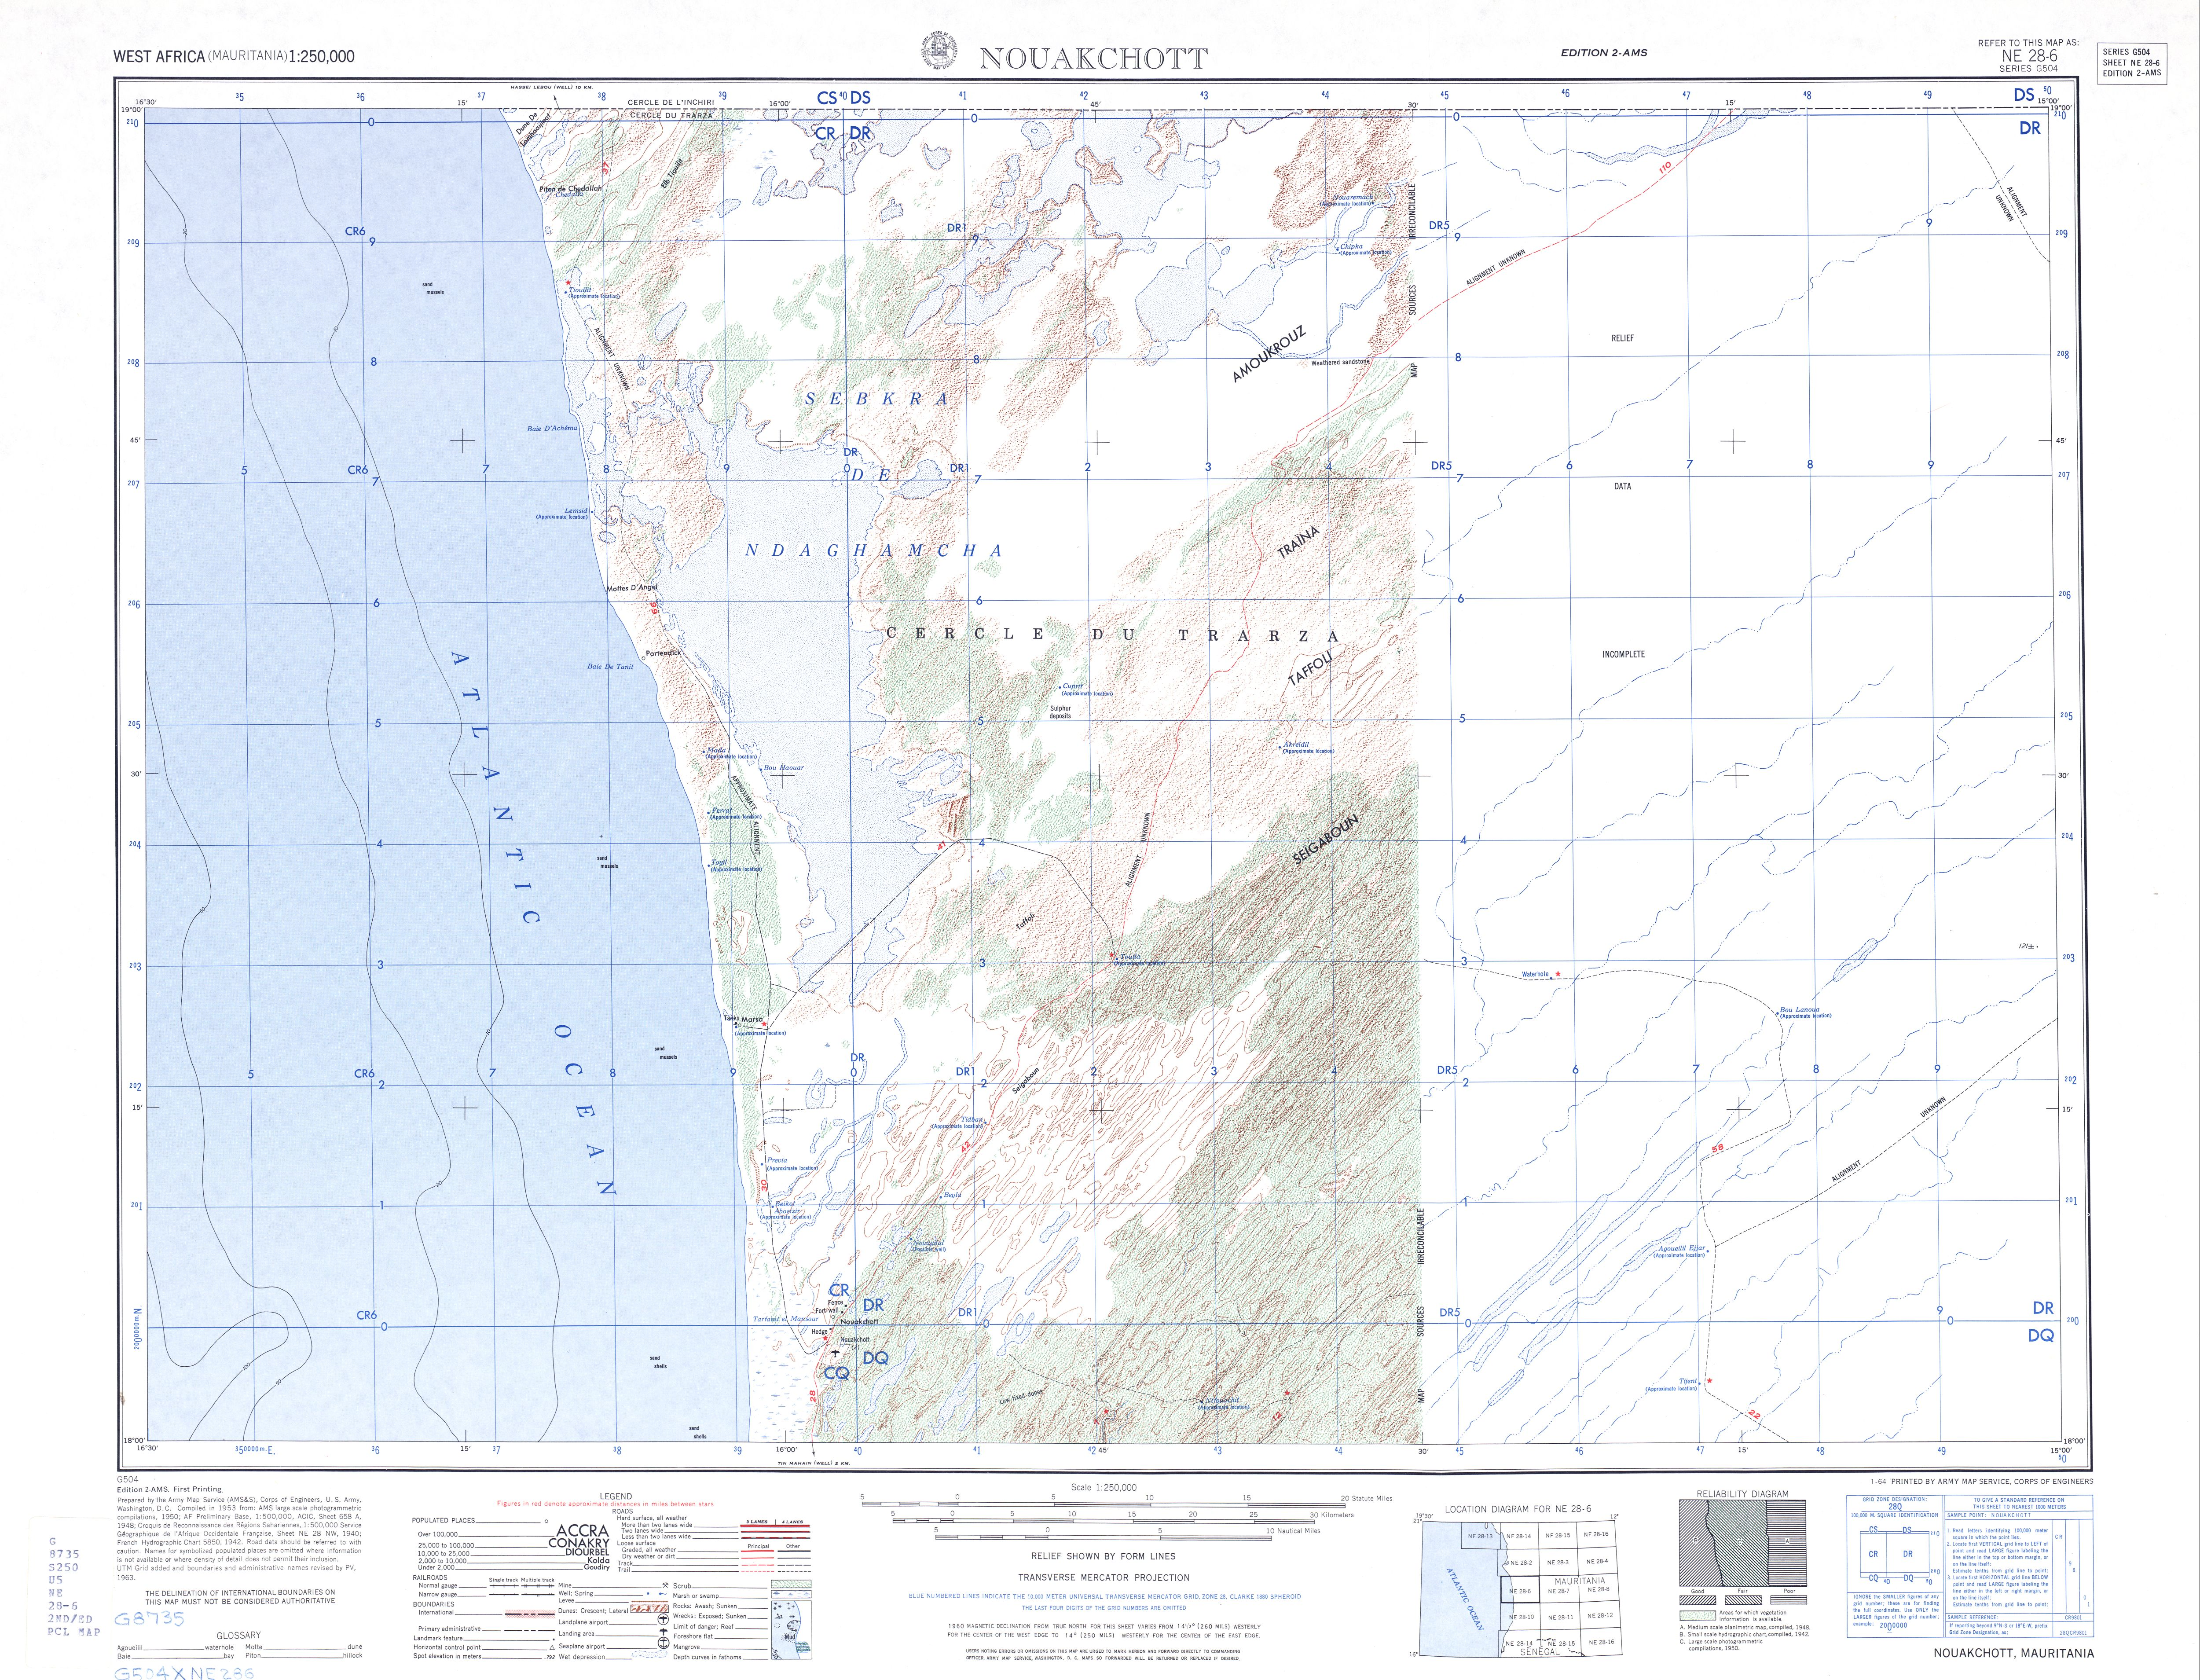 Hoja Nuakchott del Mapa Topográfico de África Occidental 1955